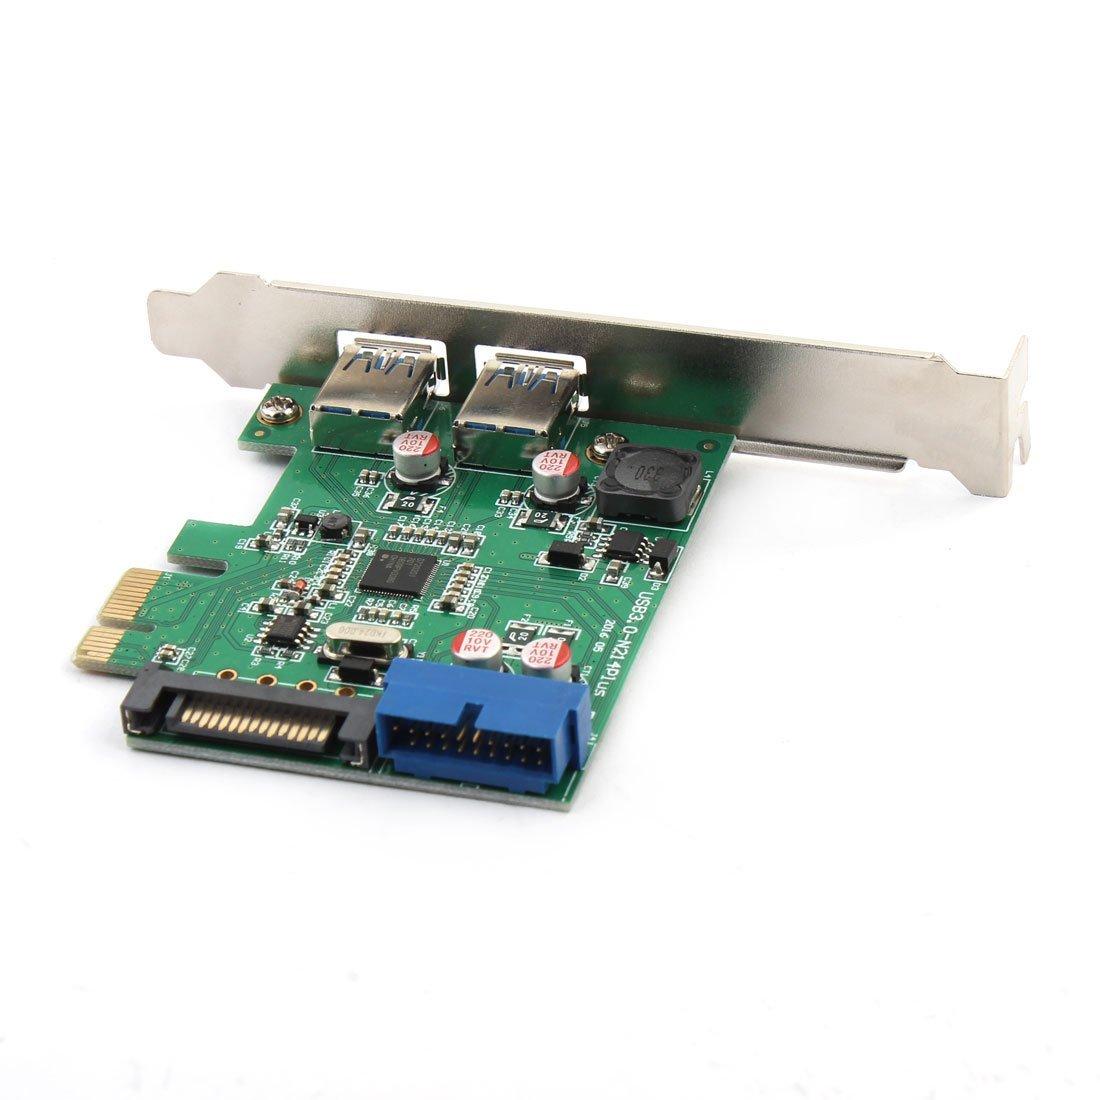 Amazon.com: eDealMax ordenador PCI-E 3.0 a la tarjeta de ...